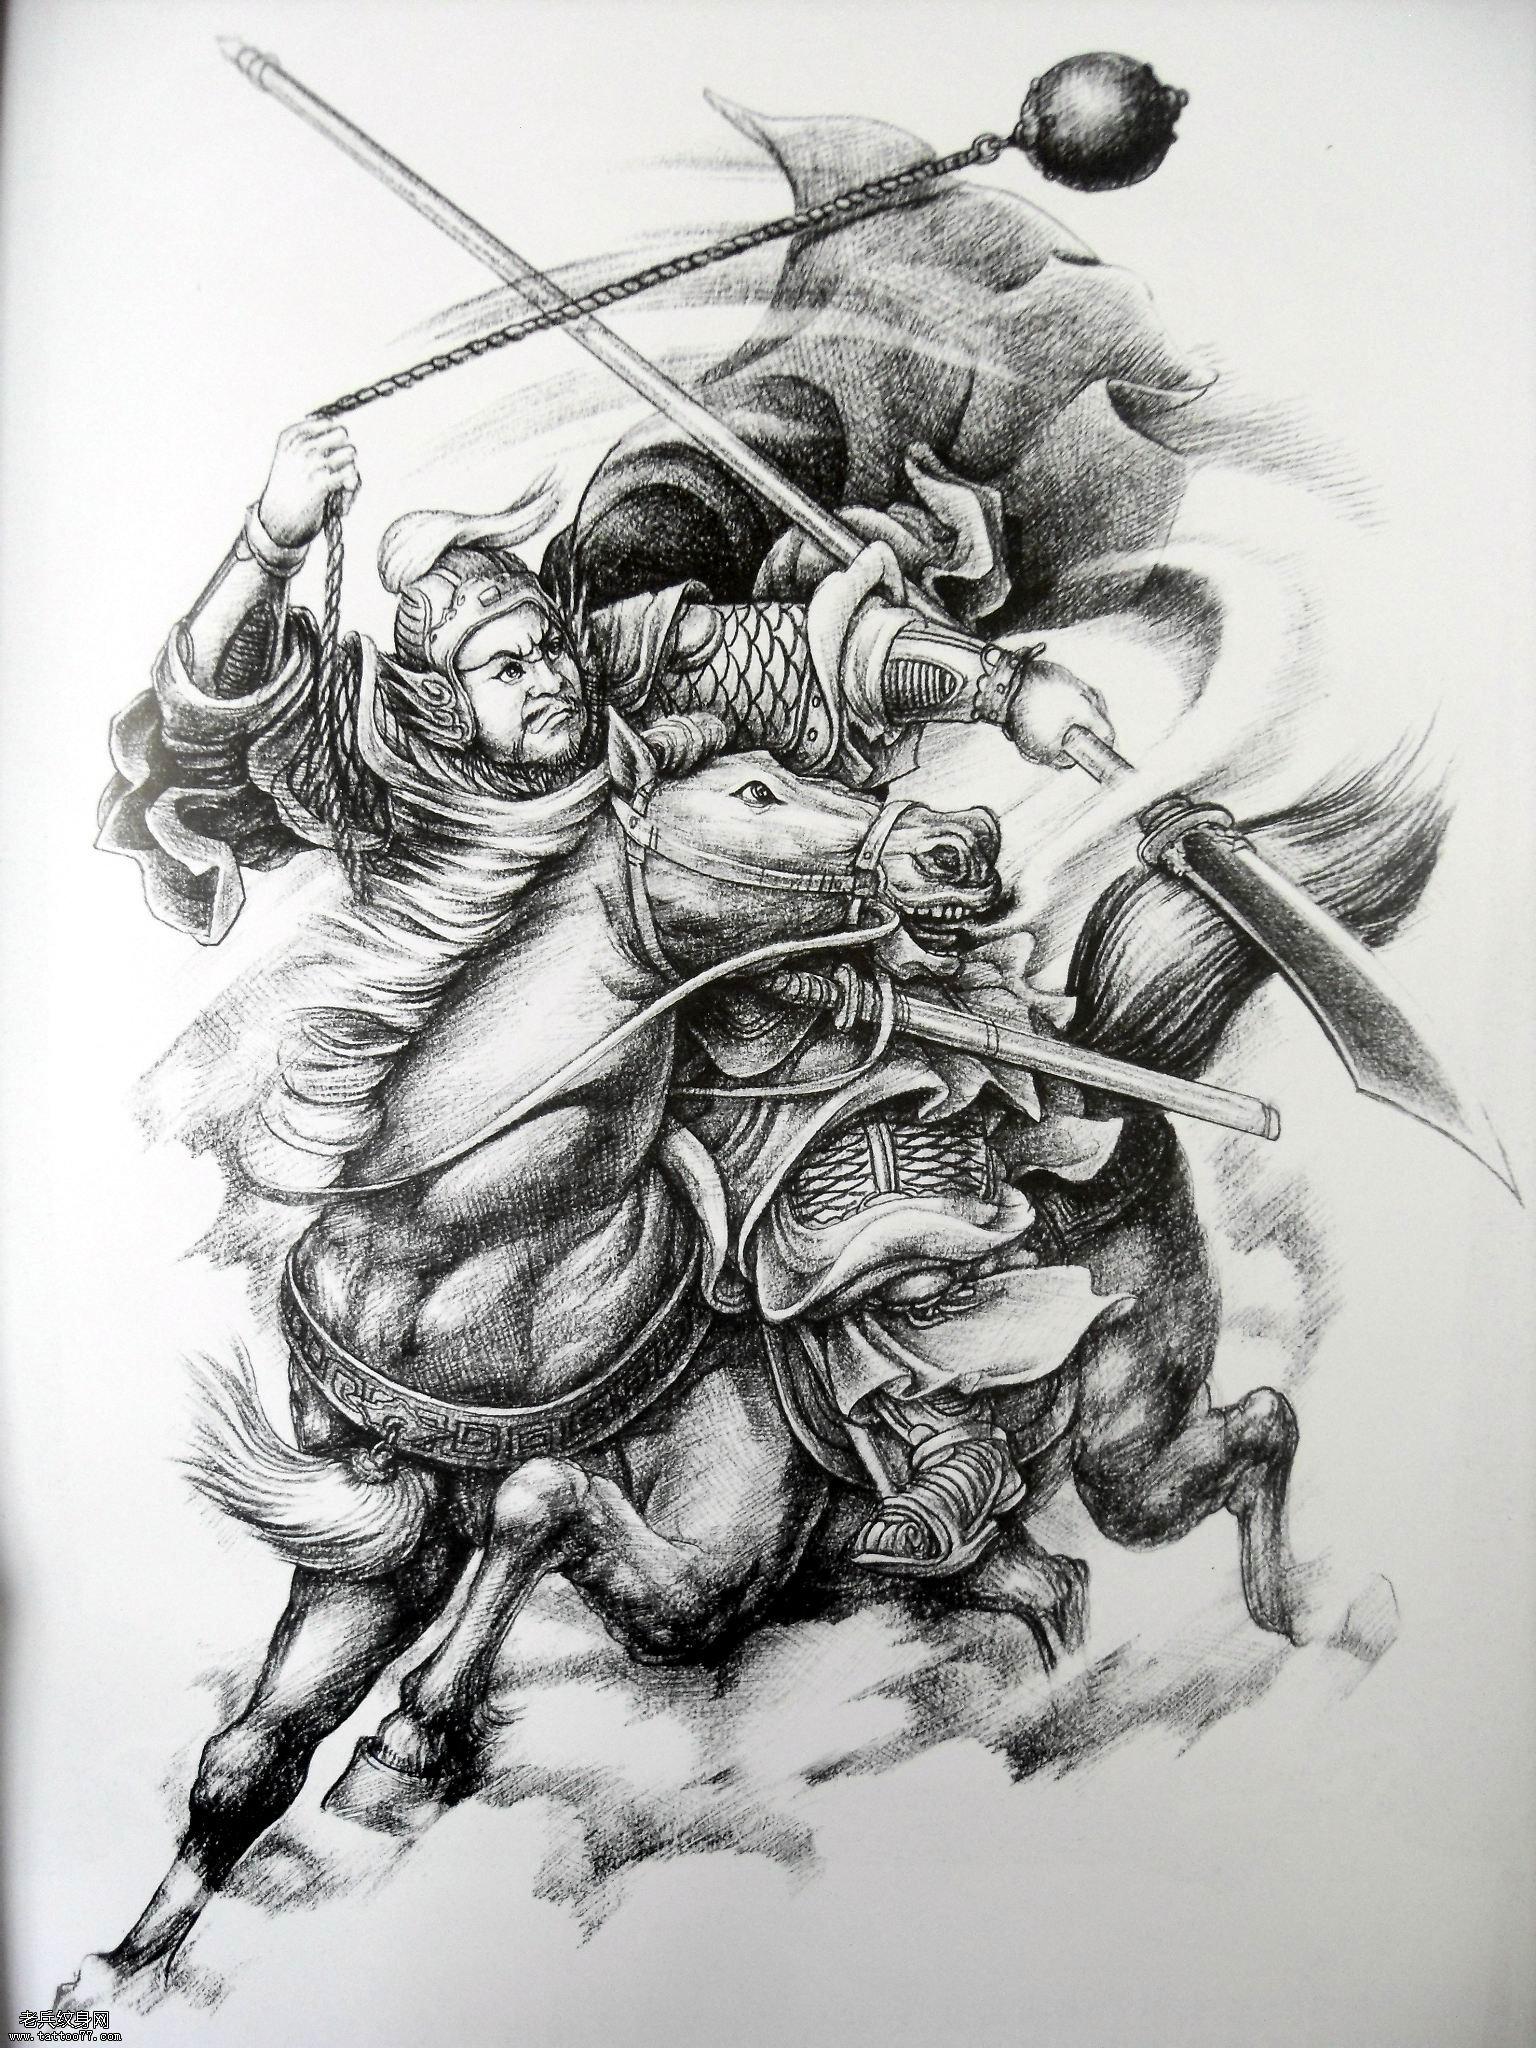 Drawn samurai horse Pin Woodburning khách binh_kiếm on